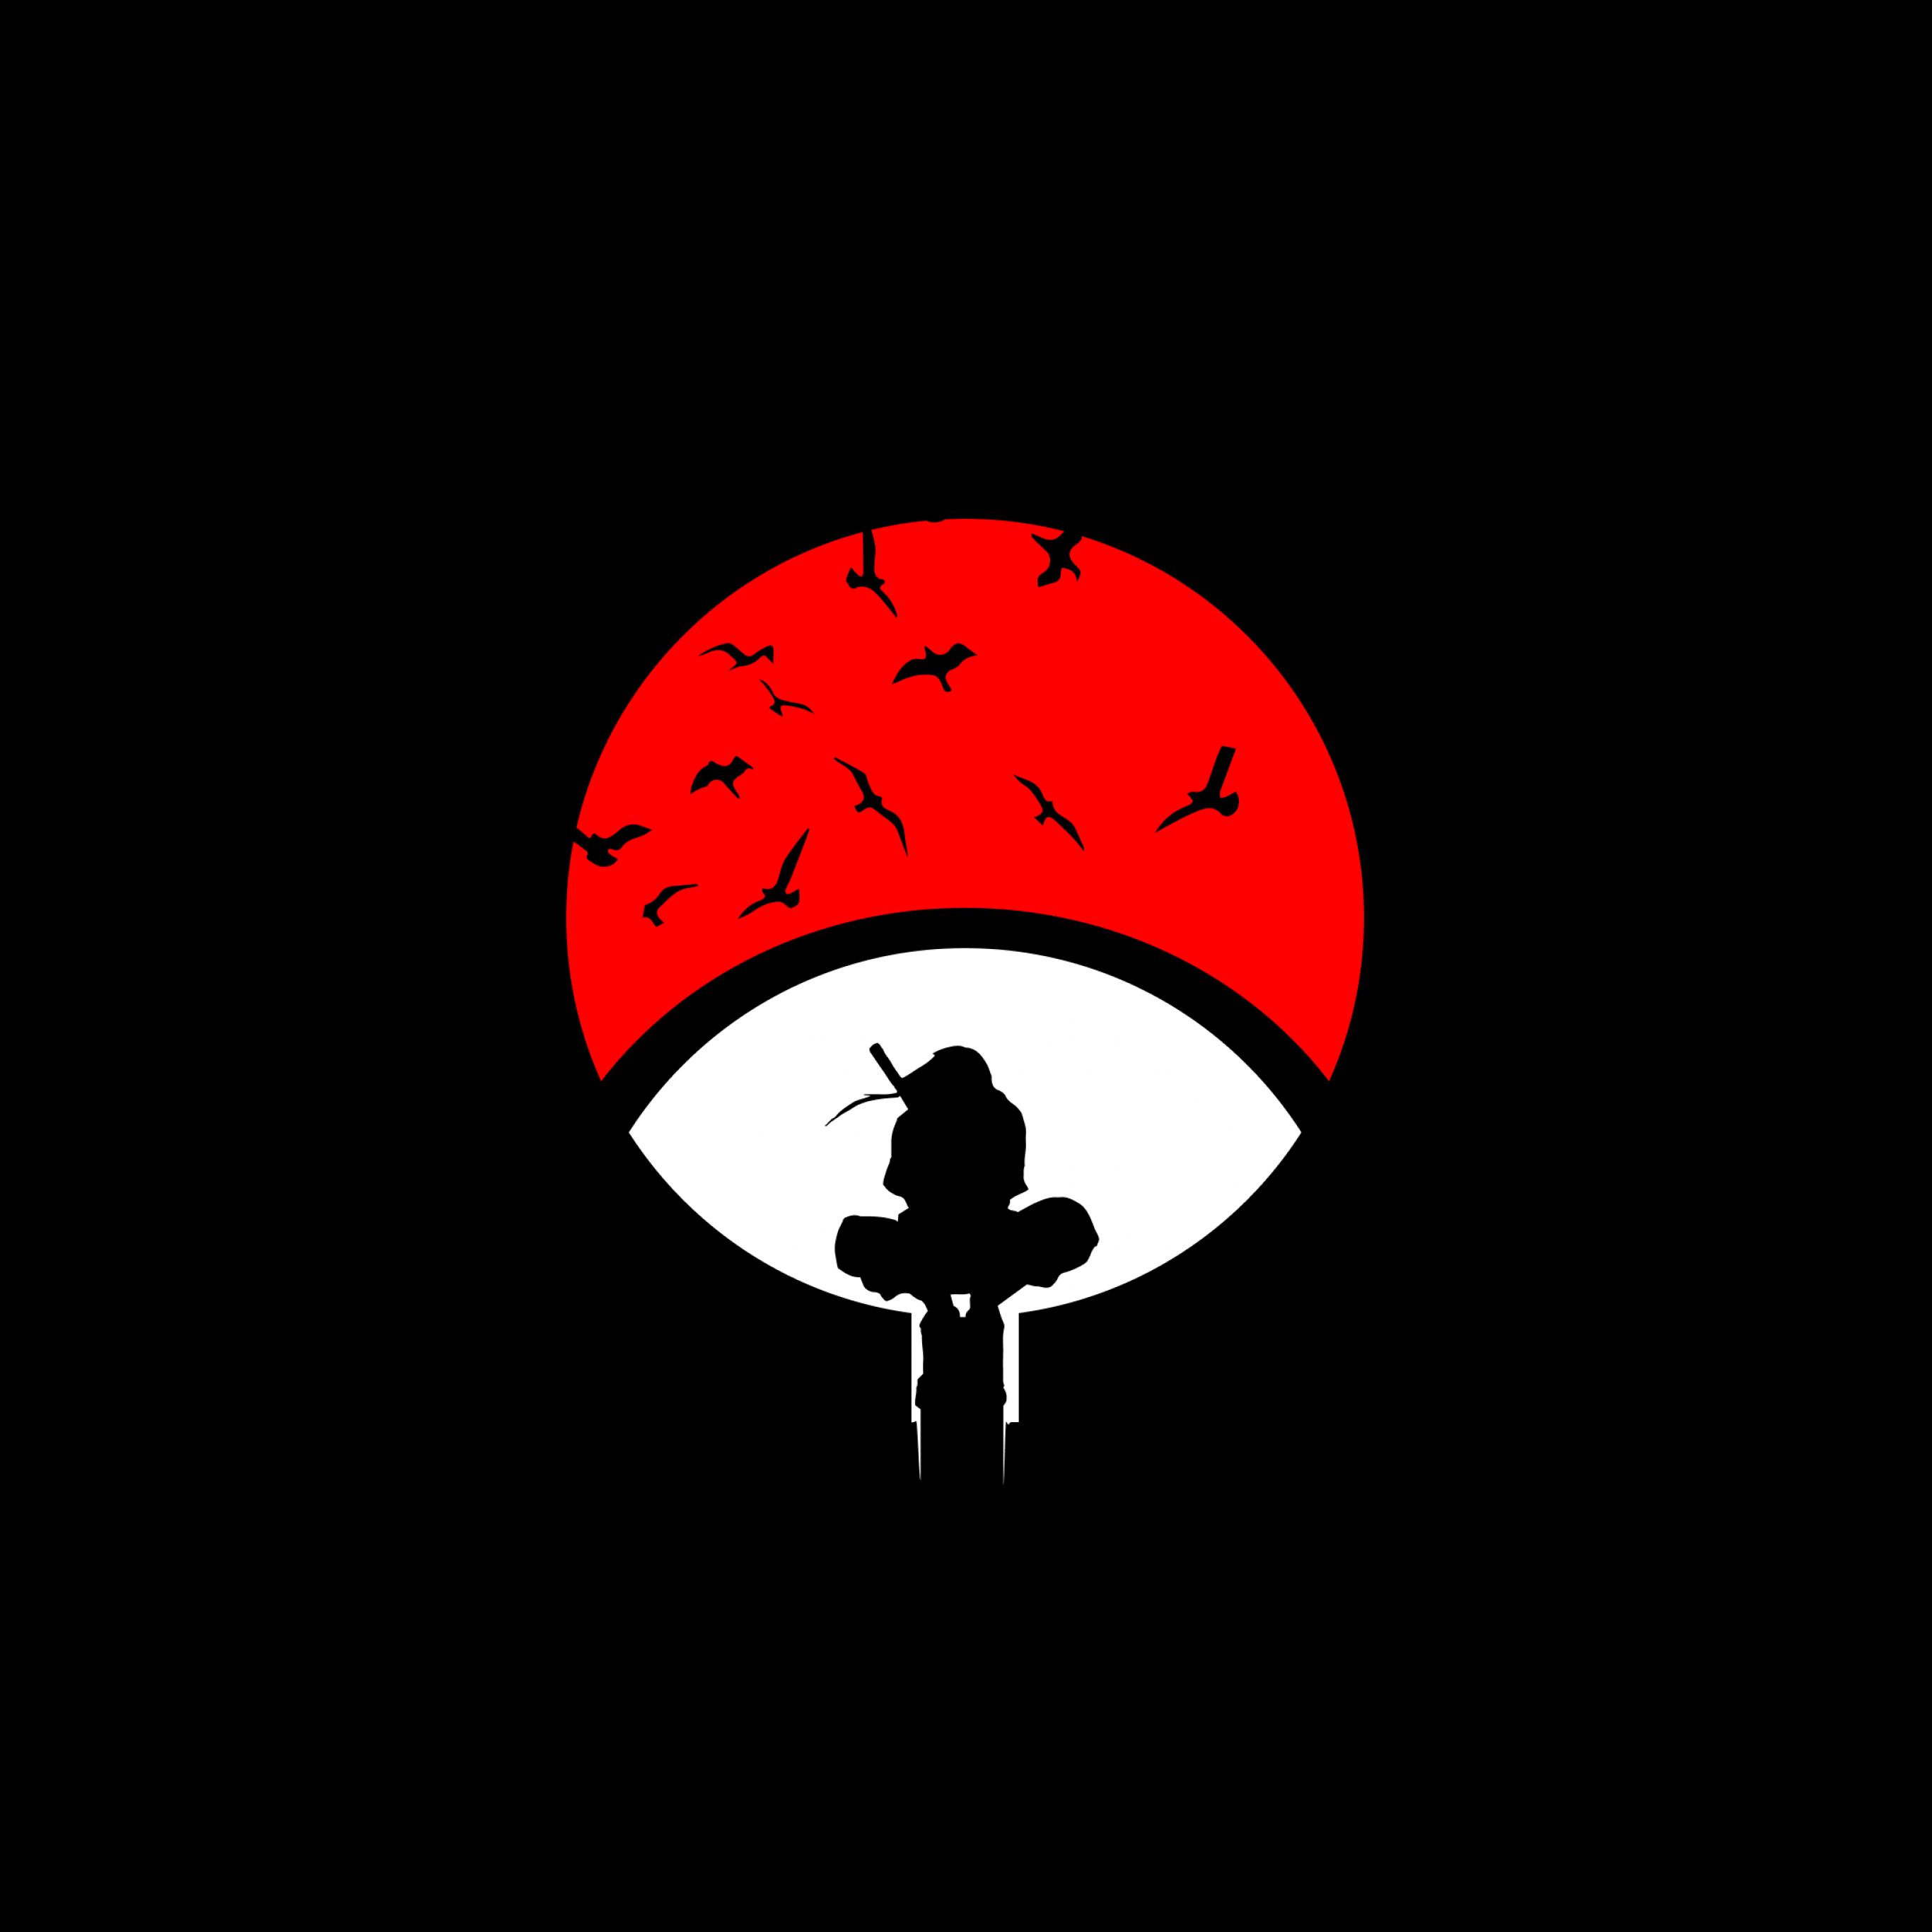 Itachi Uchiha 4k Wallpaper Naruto Black Background Black Dark 4942